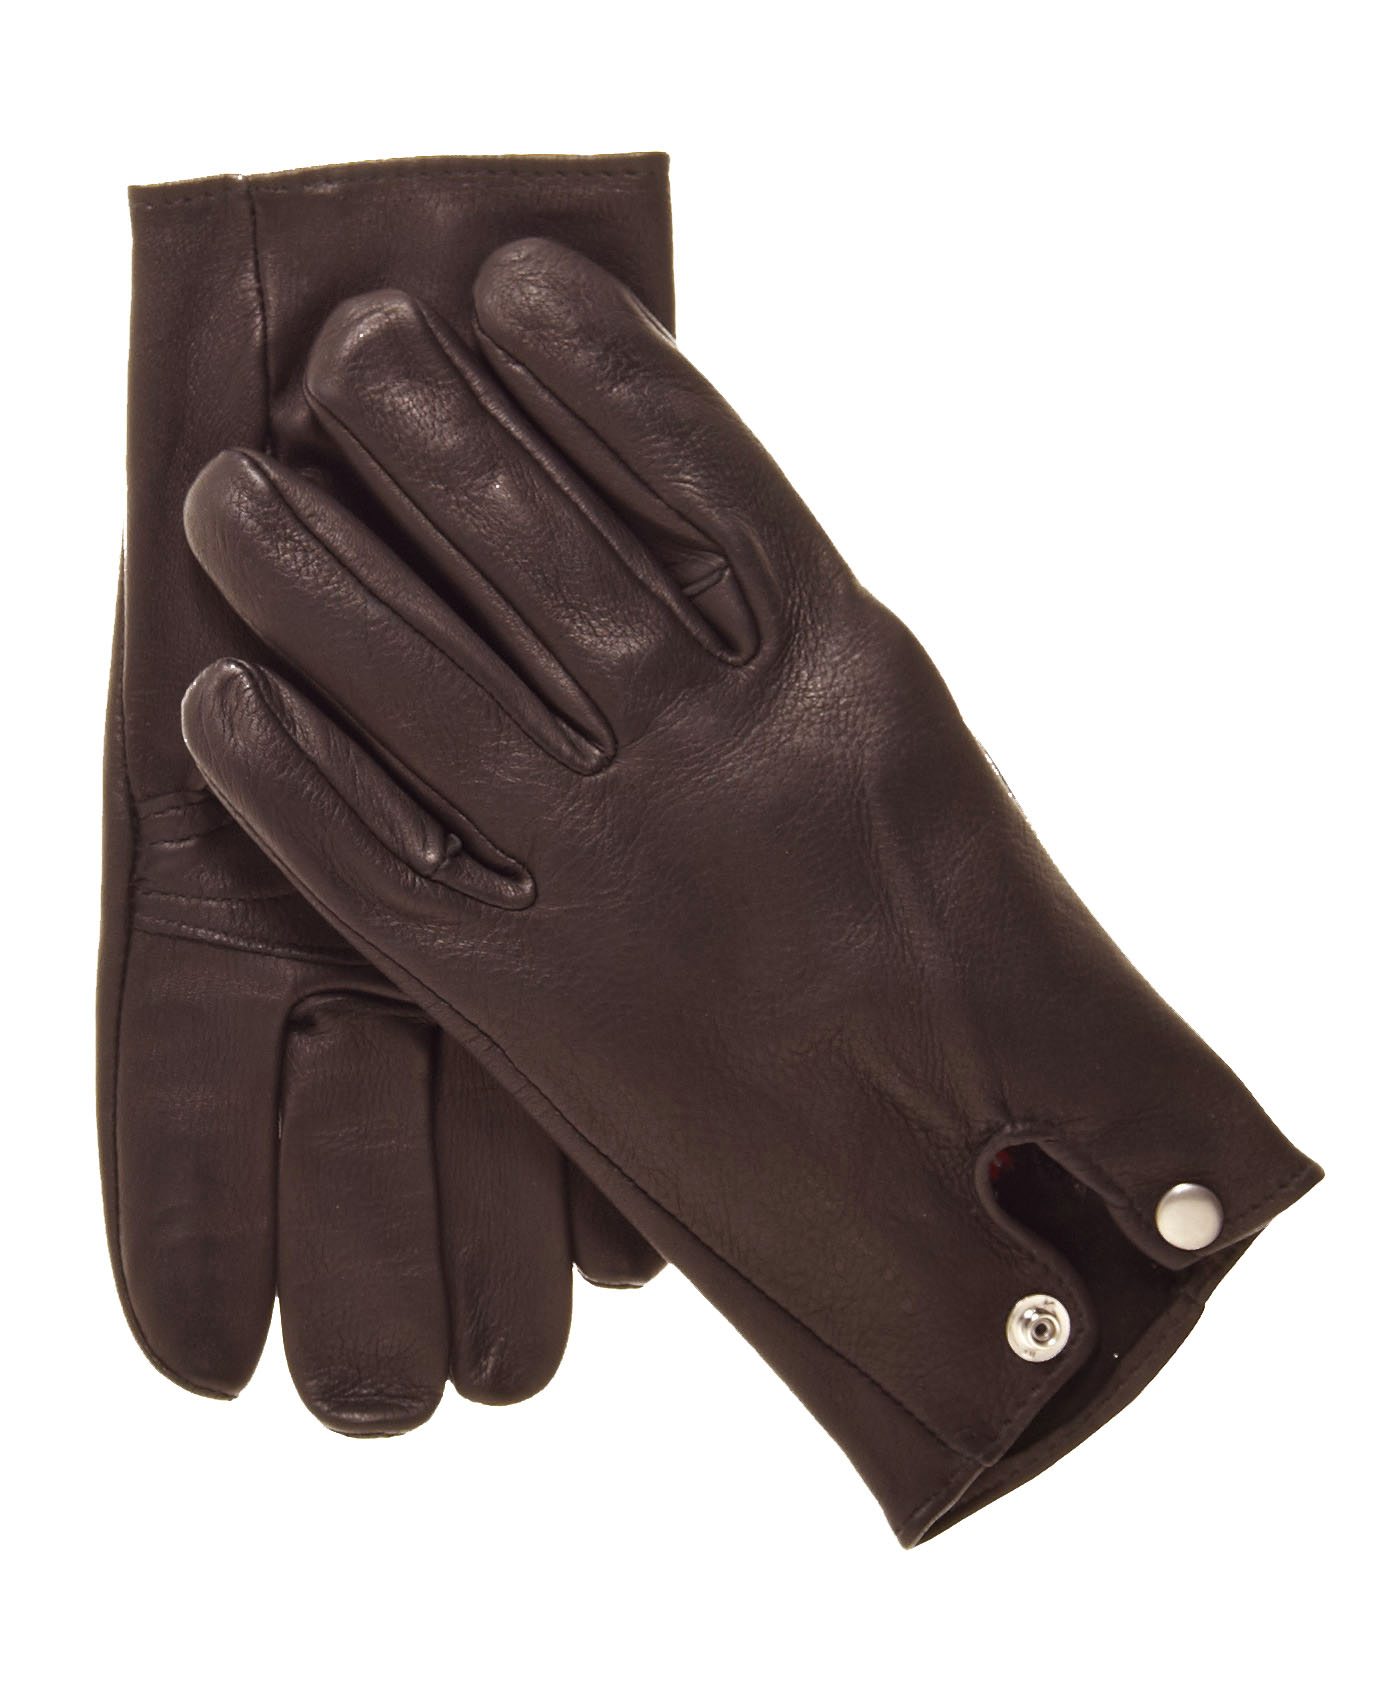 Geier Glove Men's Deerskin Roper Gloves